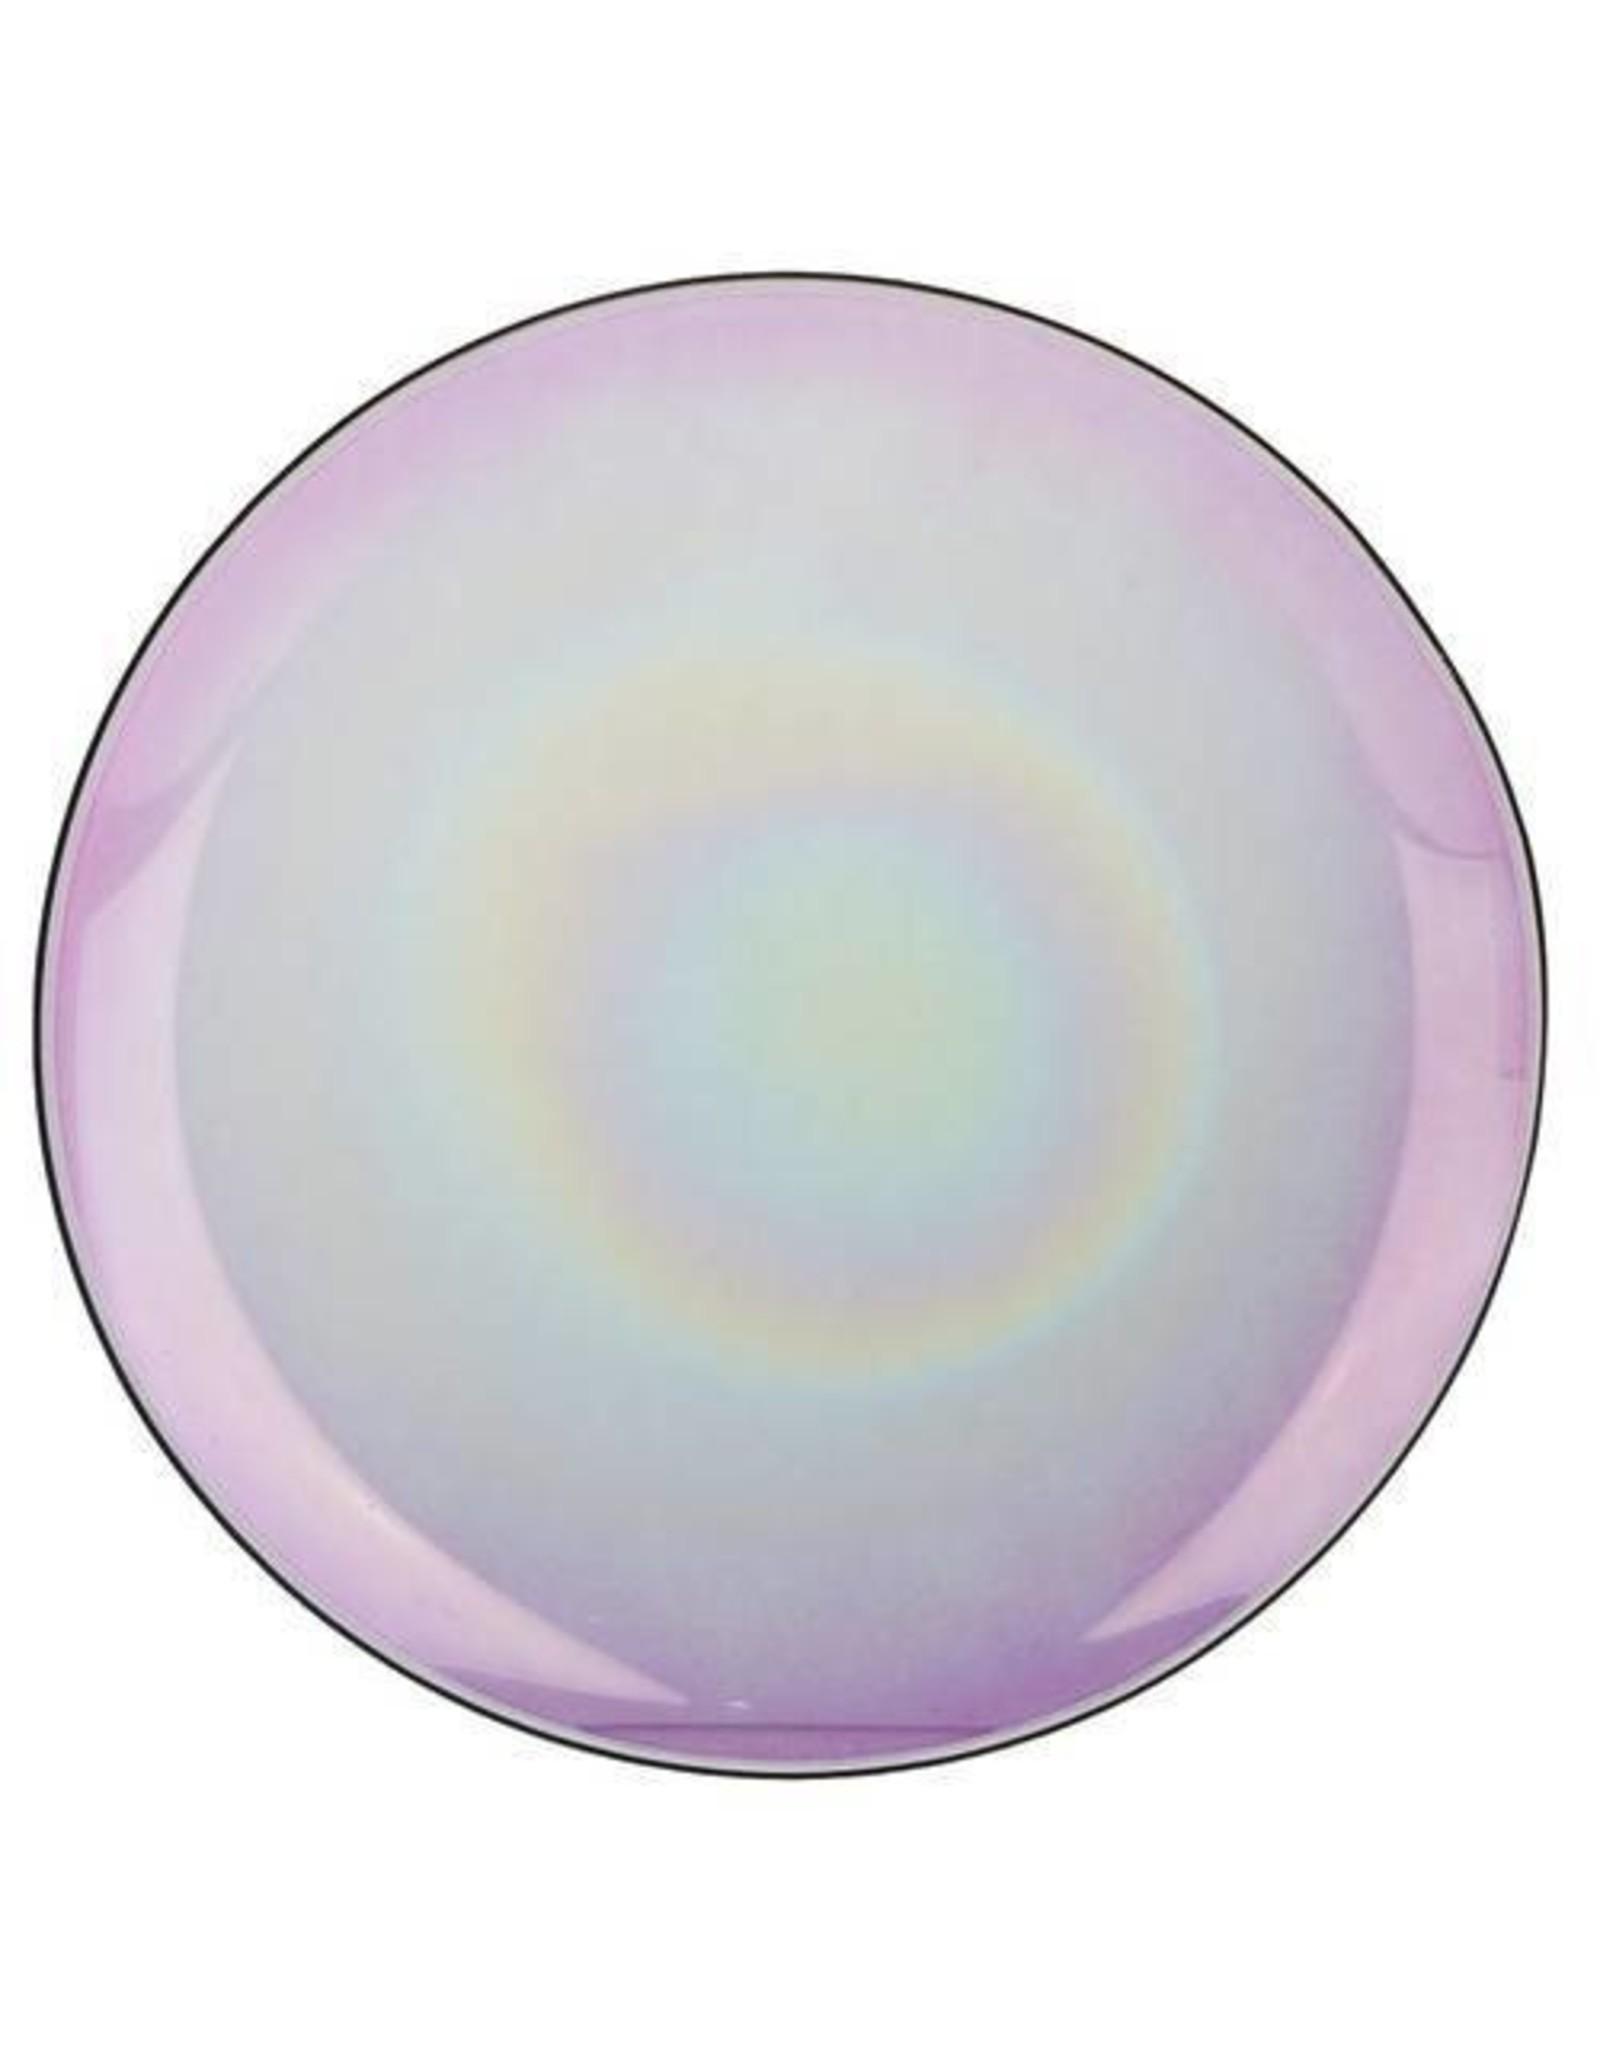 Yankee Candle Savoy - Large Shade & Tray Purple